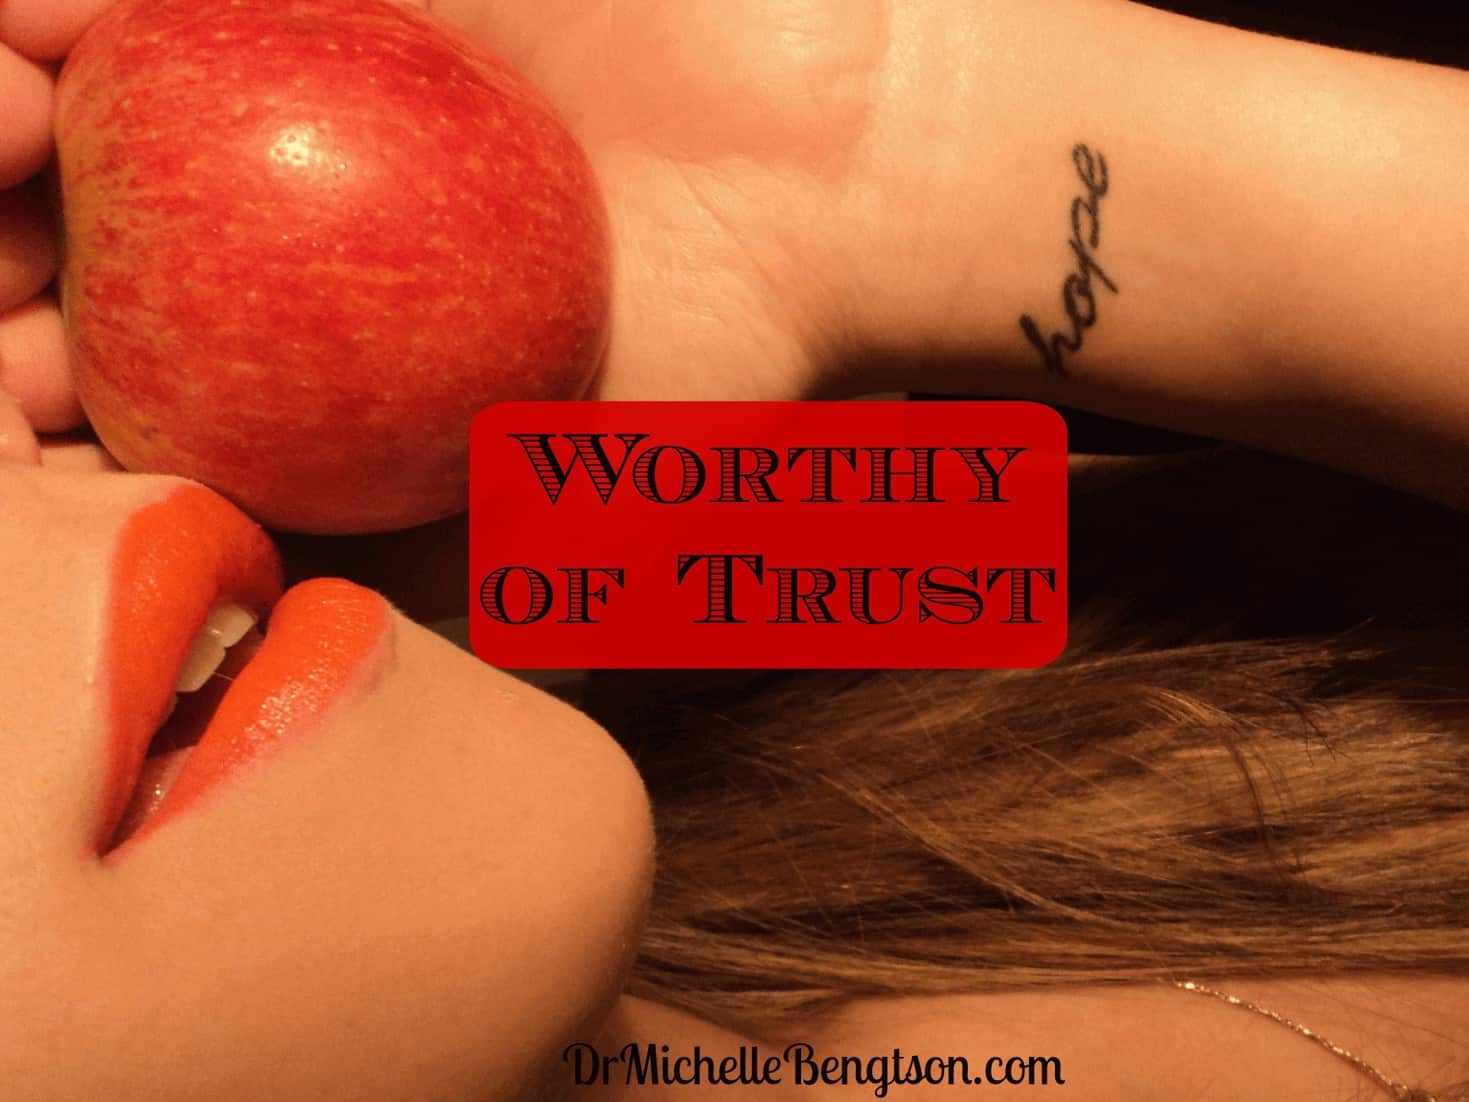 Worthy of Trust